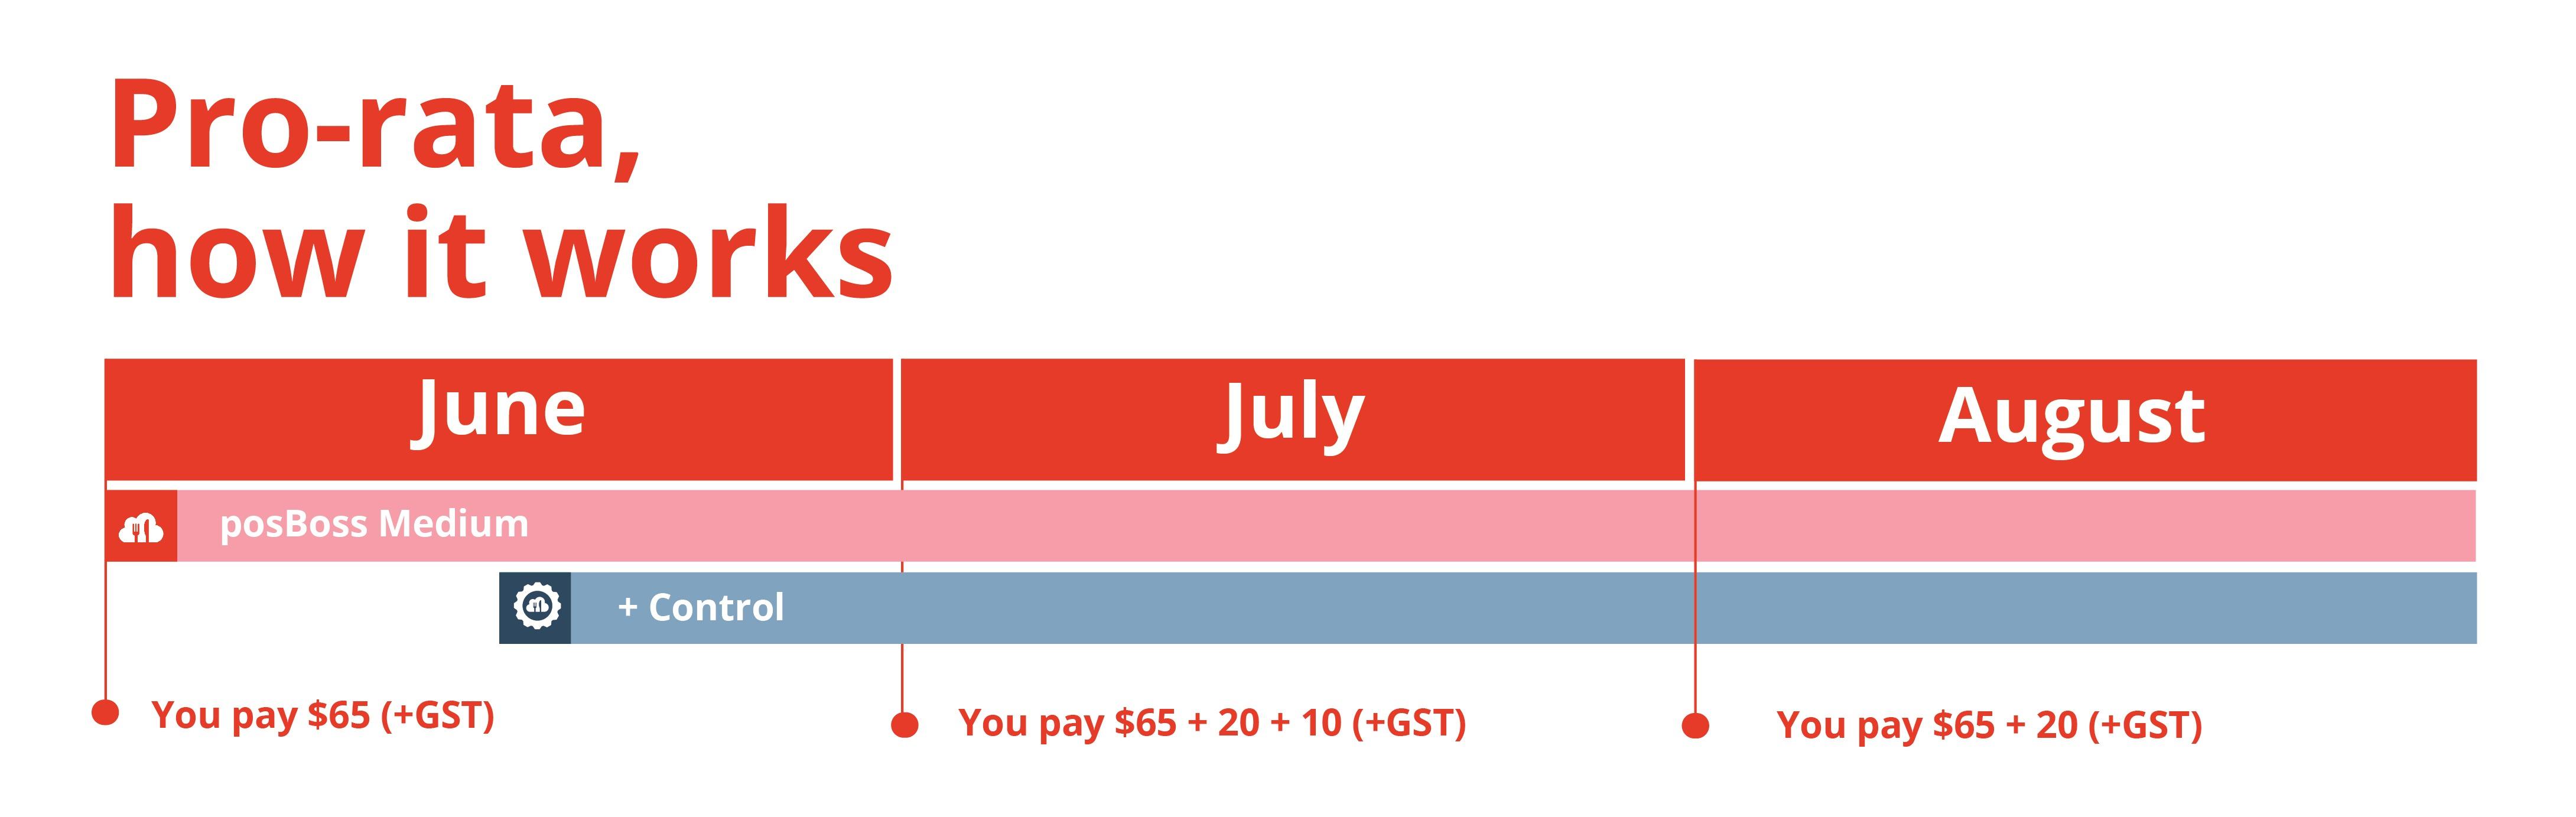 posBoss payments - pro rata